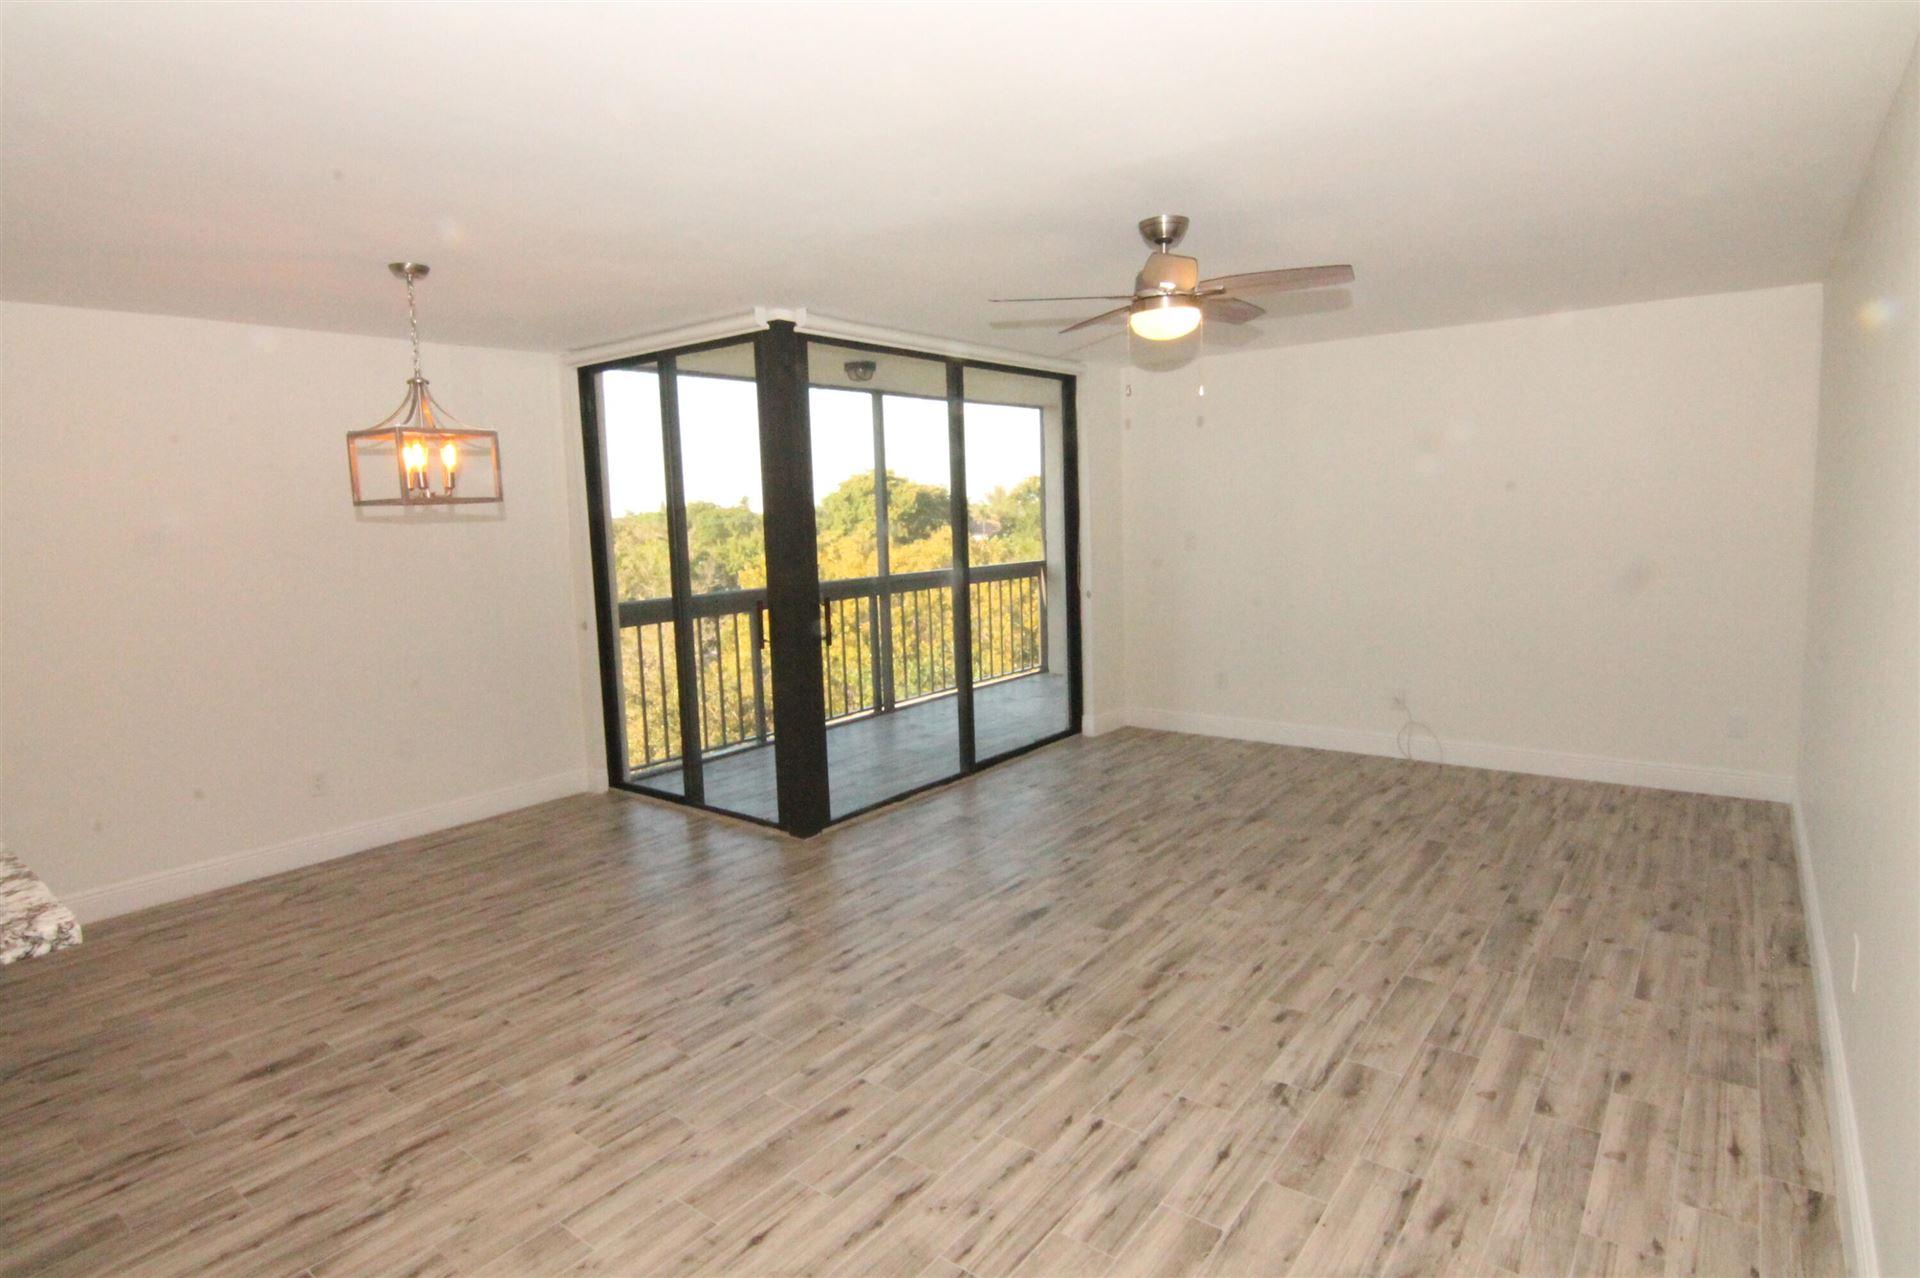 Photo of 950 Lavers Circle #F501, Delray Beach, FL 33444 (MLS # RX-10721272)